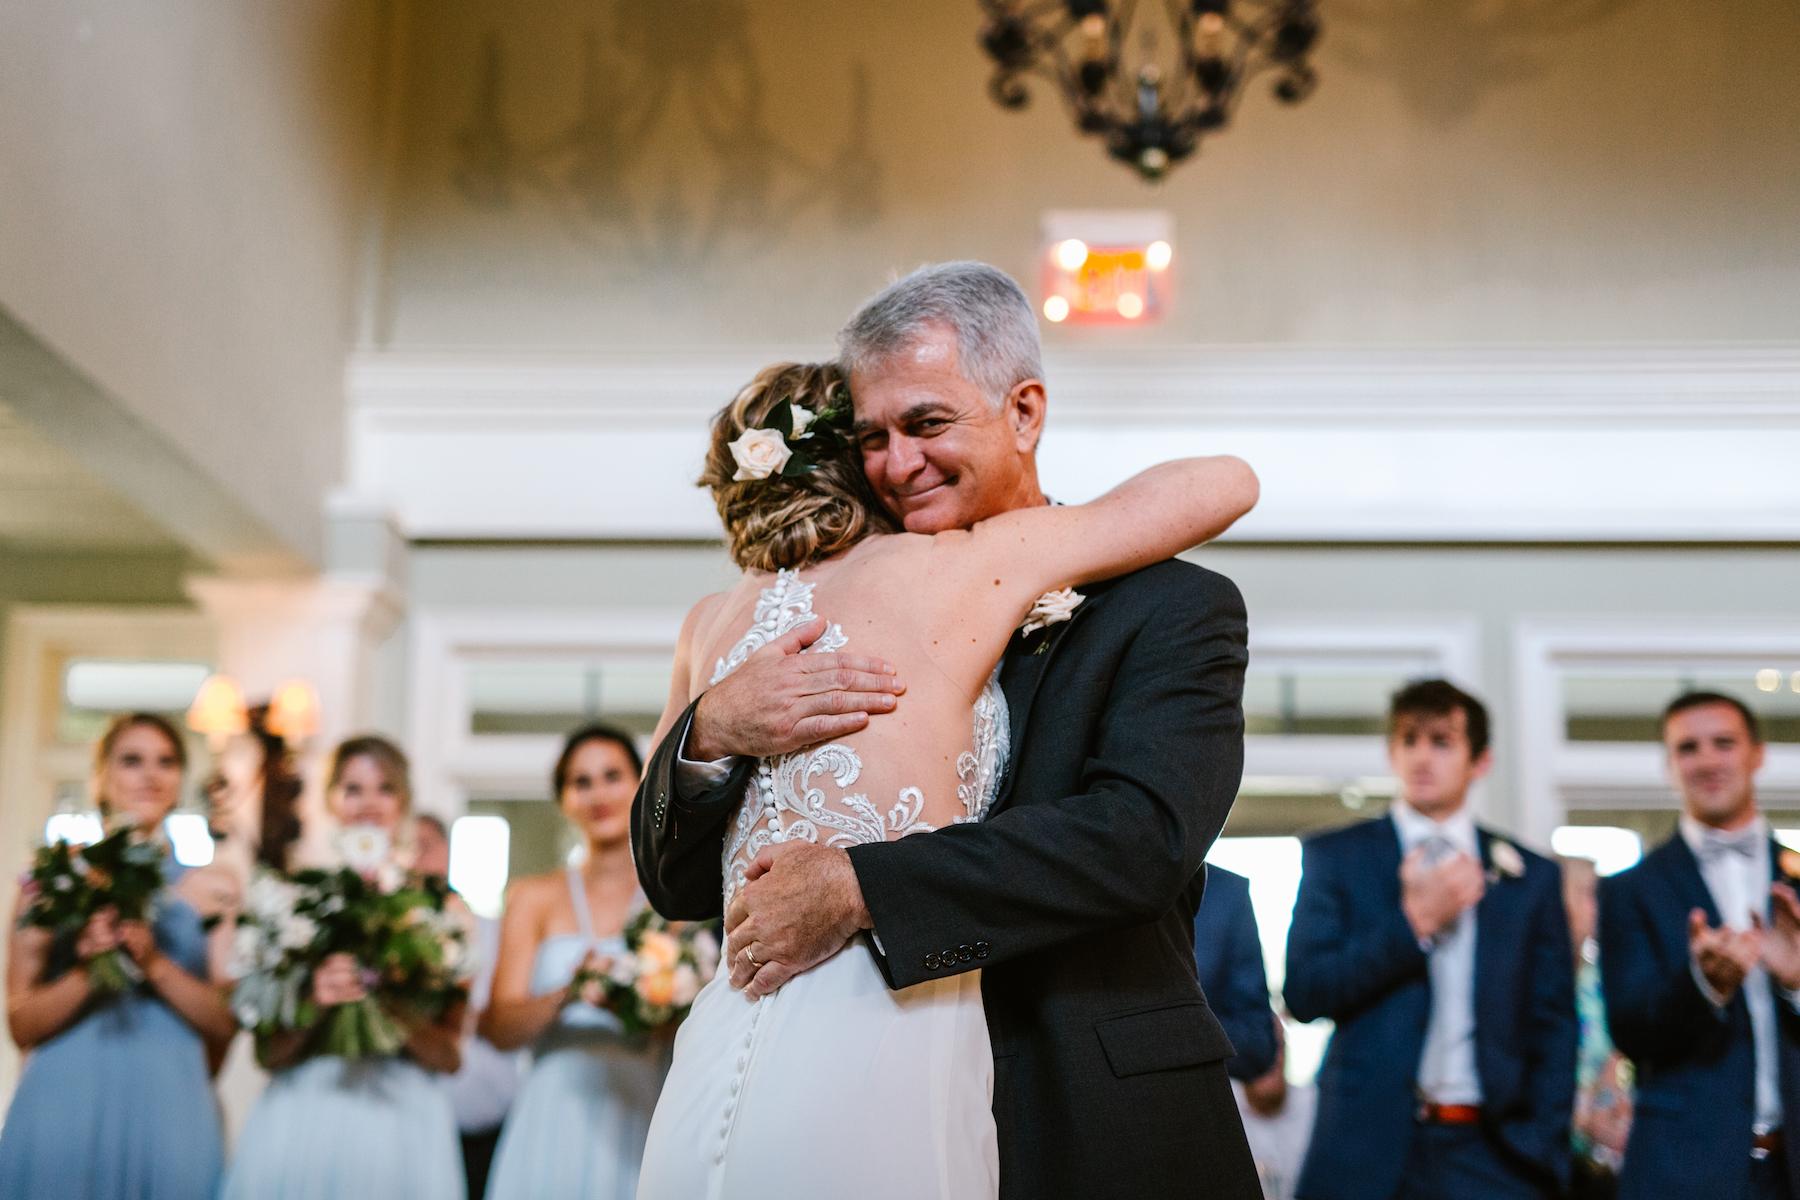 wedding-engagement-photographer-spartanburg-greenville-columbia-carolina-south-north-517.JPG